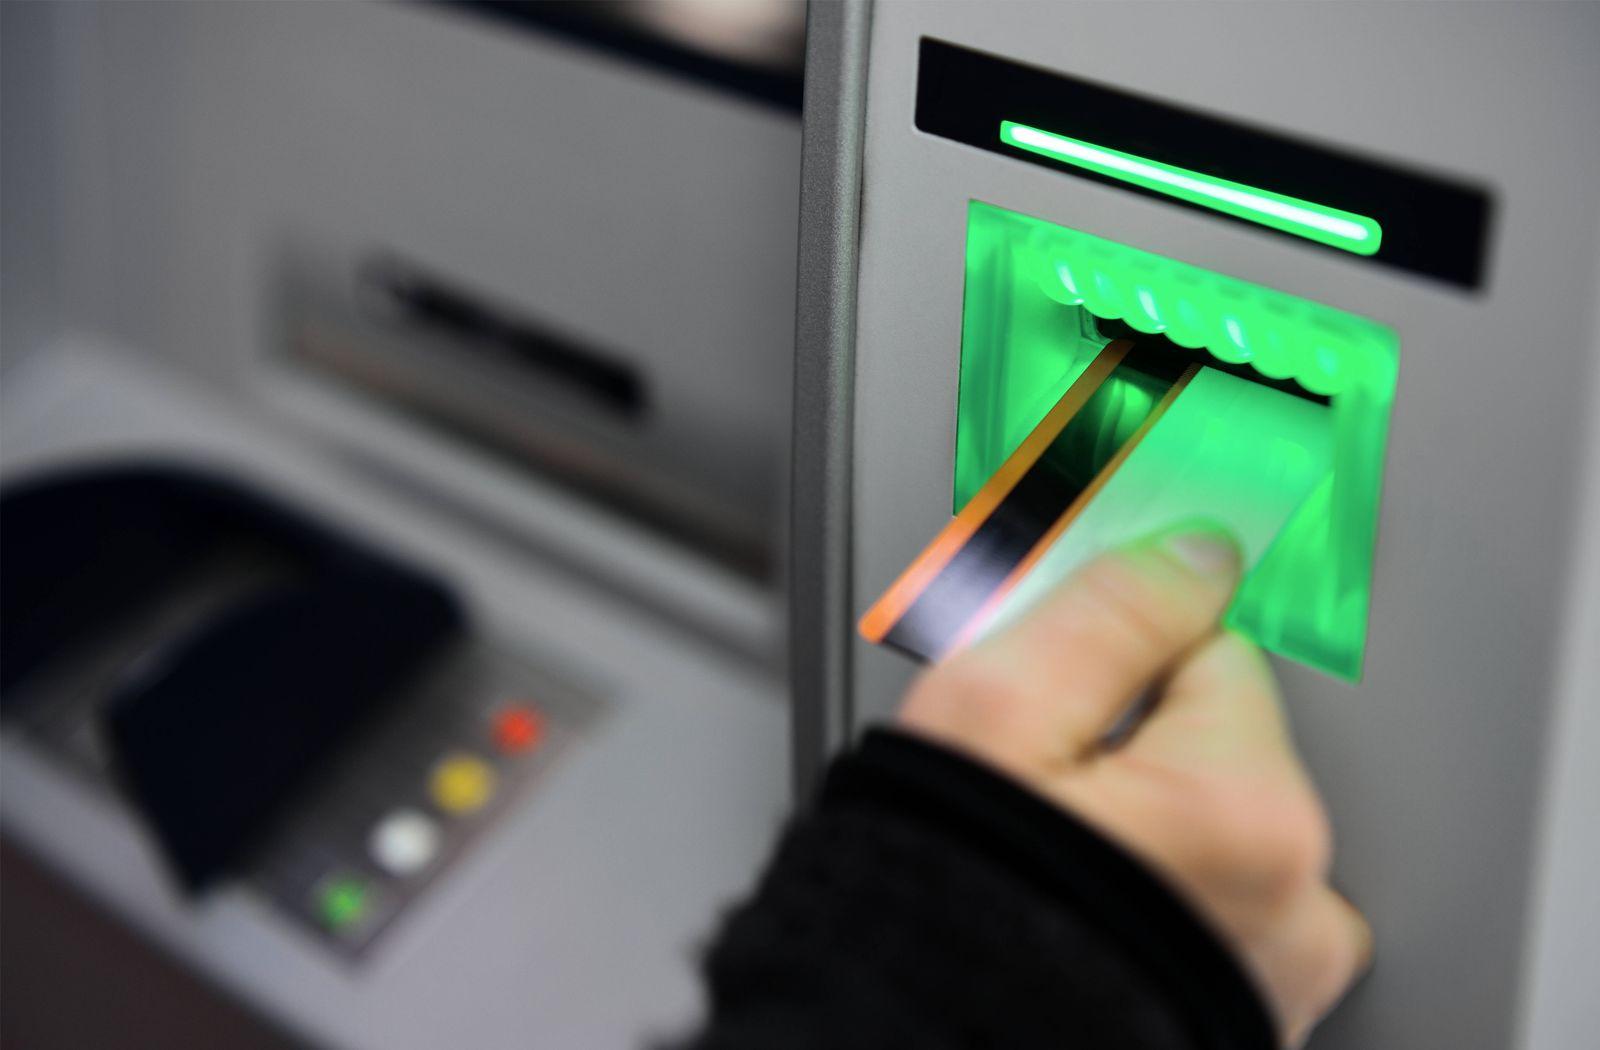 abheben,geldautomat,bankkarte *** take off,atm,bank card ke7-ggn NUR F?R REDAKTIONELLE ZWECKE/EDITORIAL USE ONLY ,model